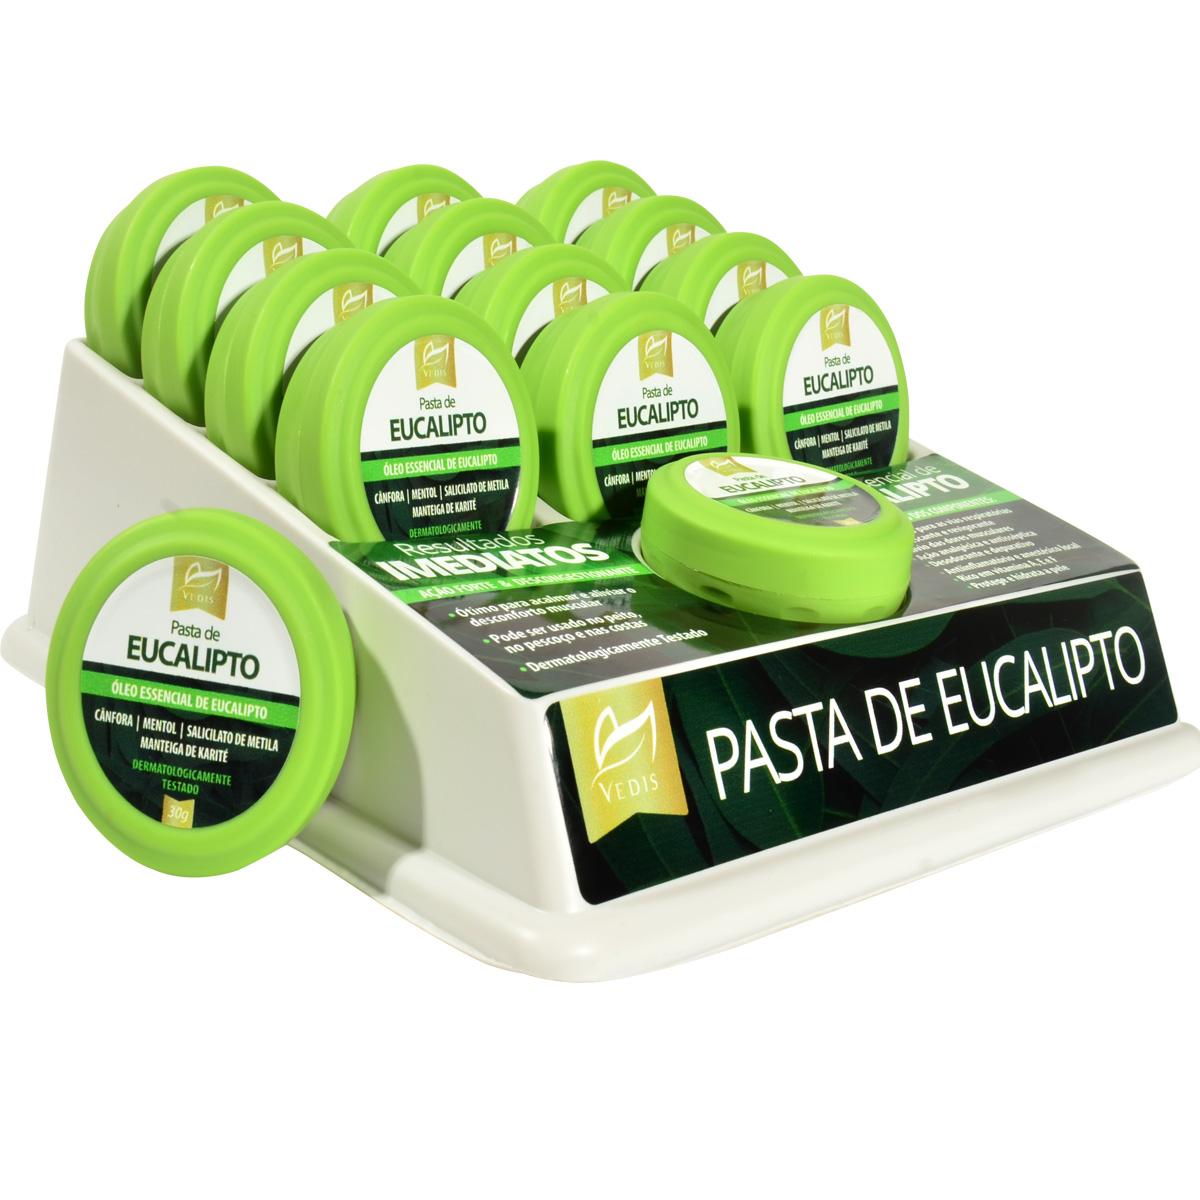 Pasta de Eucalipto com Provador Display com 12 un. de 30g - Vedis